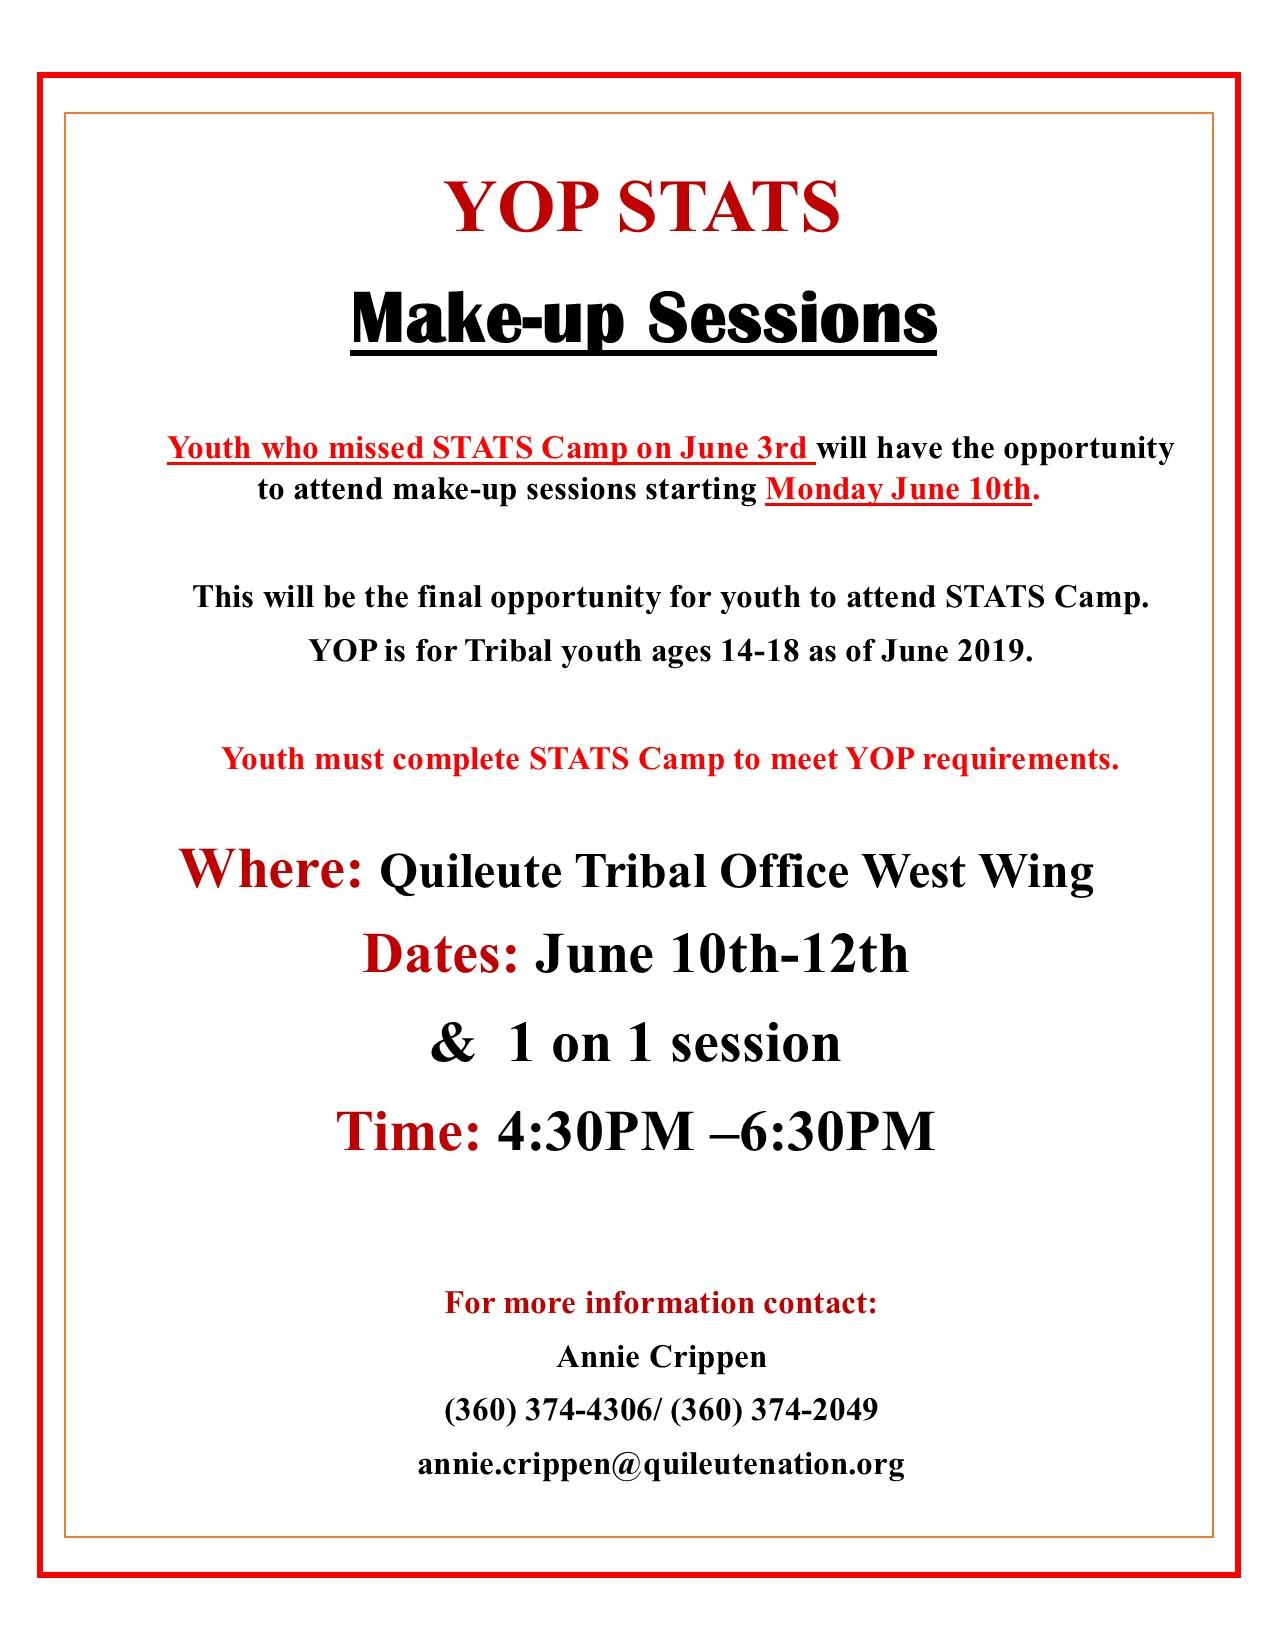 STATS Make-up Schedule